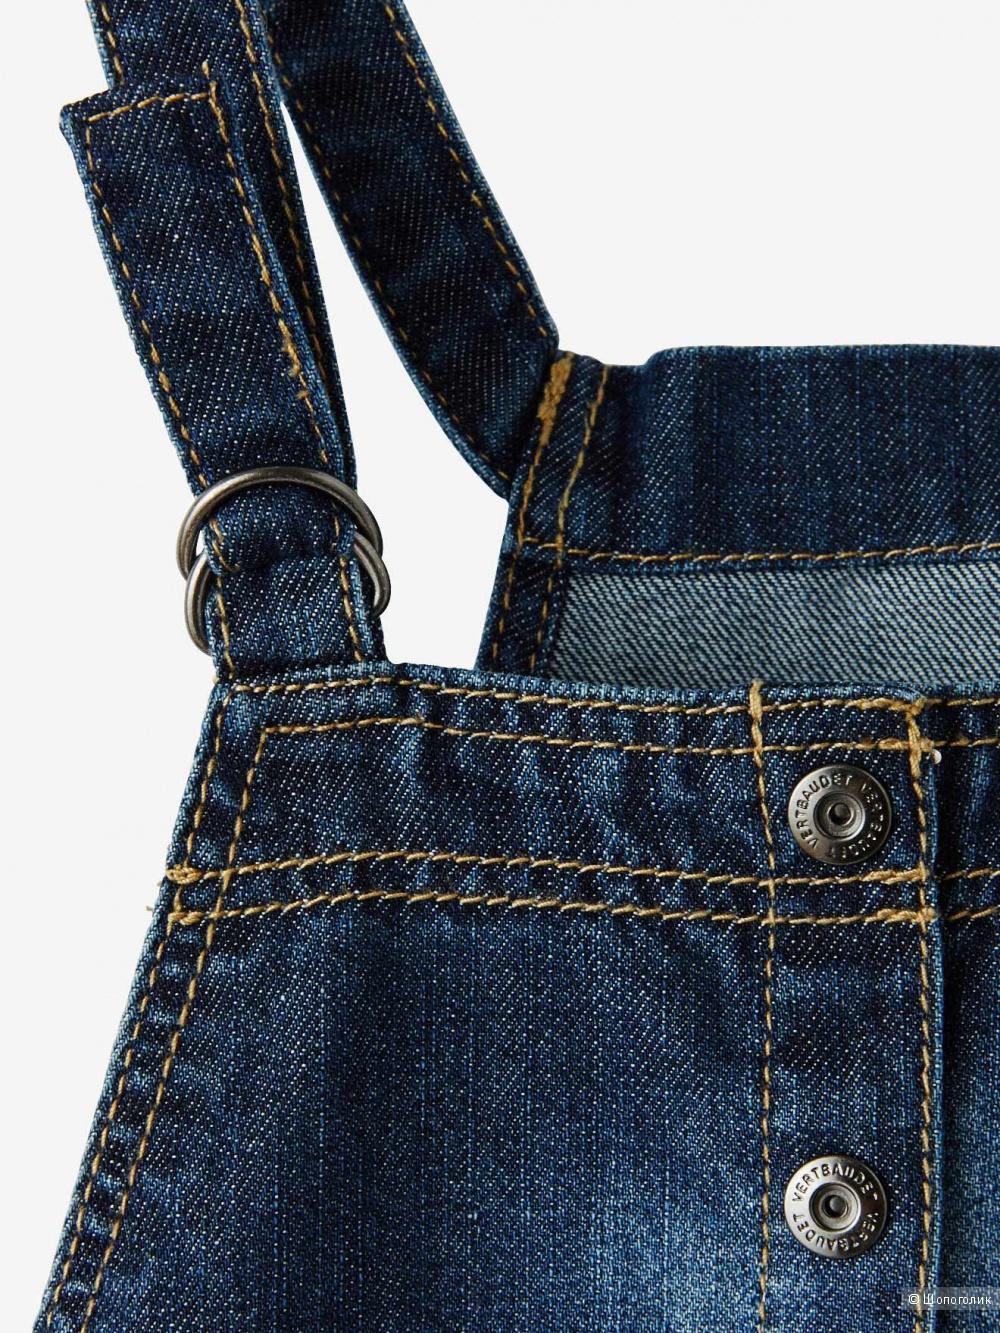 Сарафан/юбка джинсовый Verbaudet, размер 114